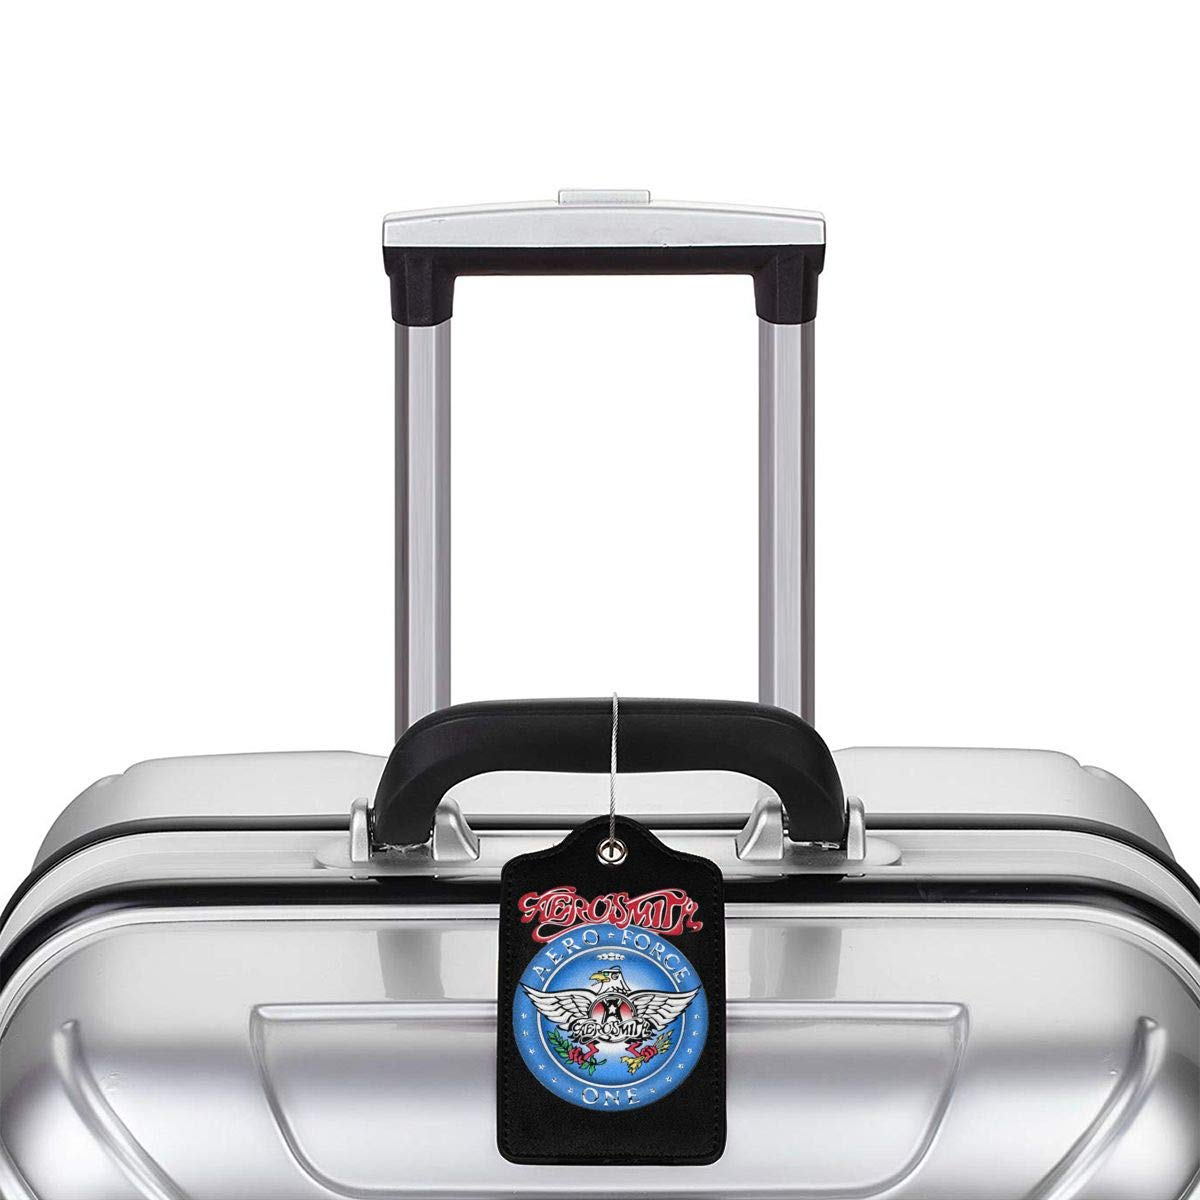 Aerosmith Aero Leather Luggage Tag Travel ID Label For Baggage Suitcase